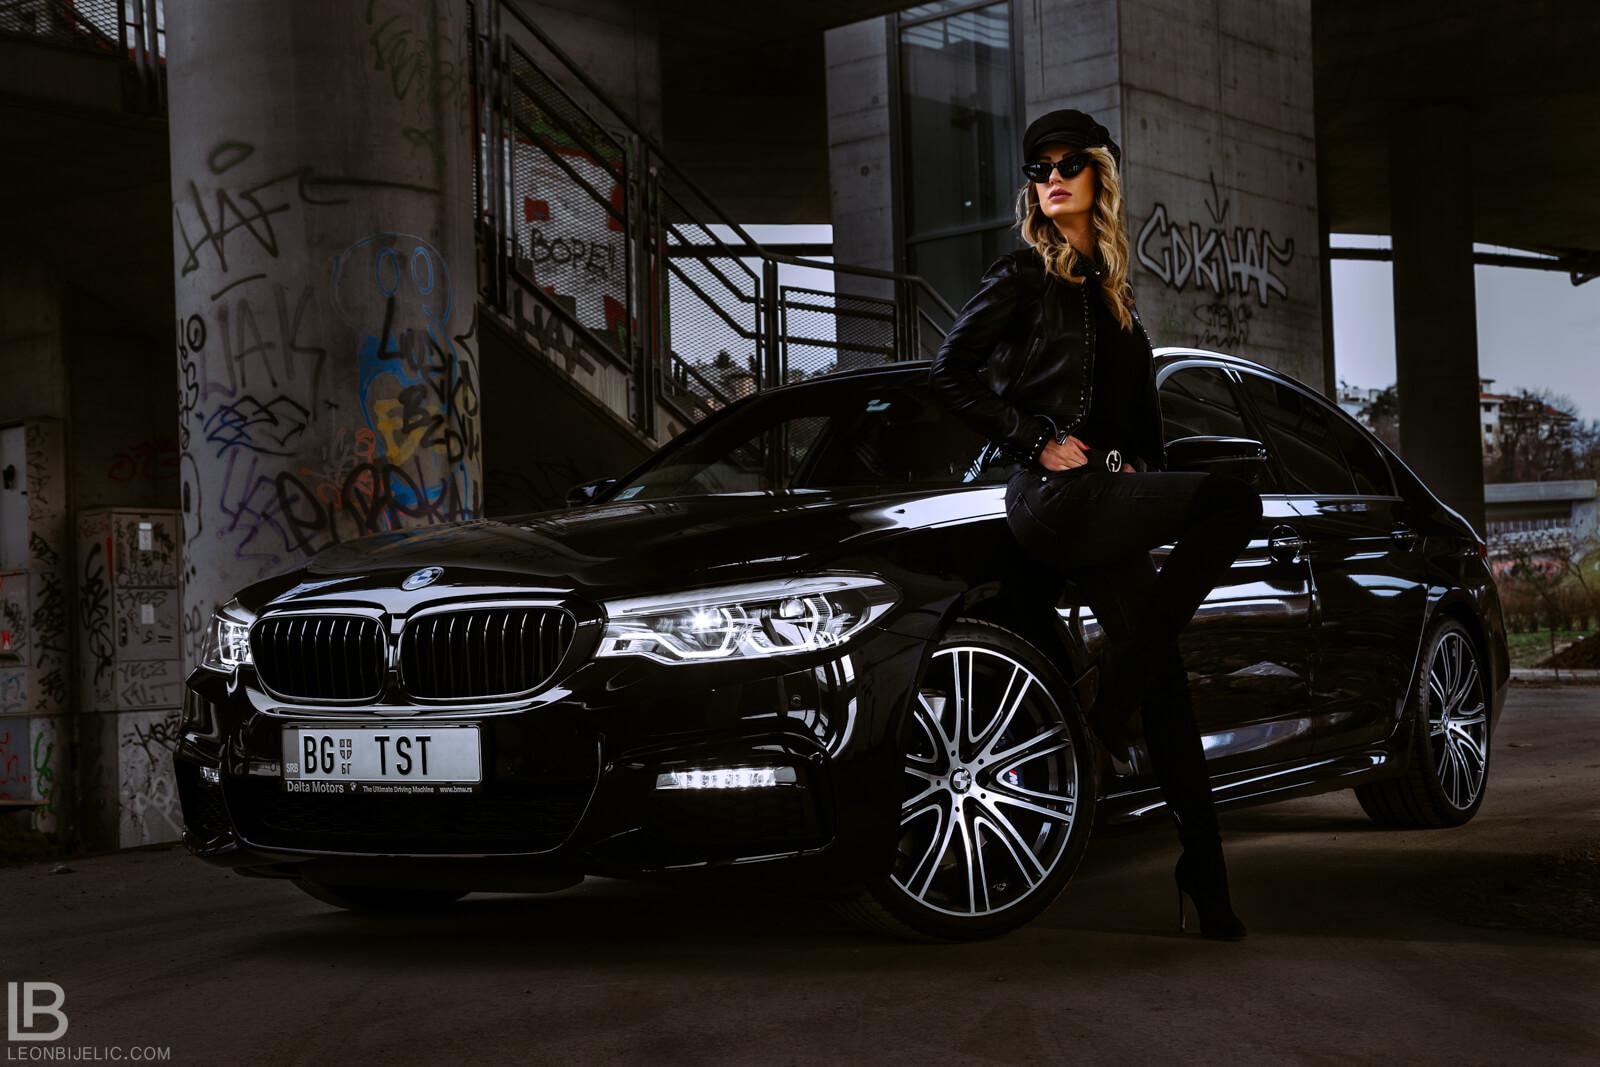 PHOTO SESSION - TIJANA STEFANOVIC - BMW 5 SERBIA BELGRADE - LEON BIJELIC COMMERCIAL AND CREATIVE PHOTOGRAPHY - BEOGRAD, SRBIJA